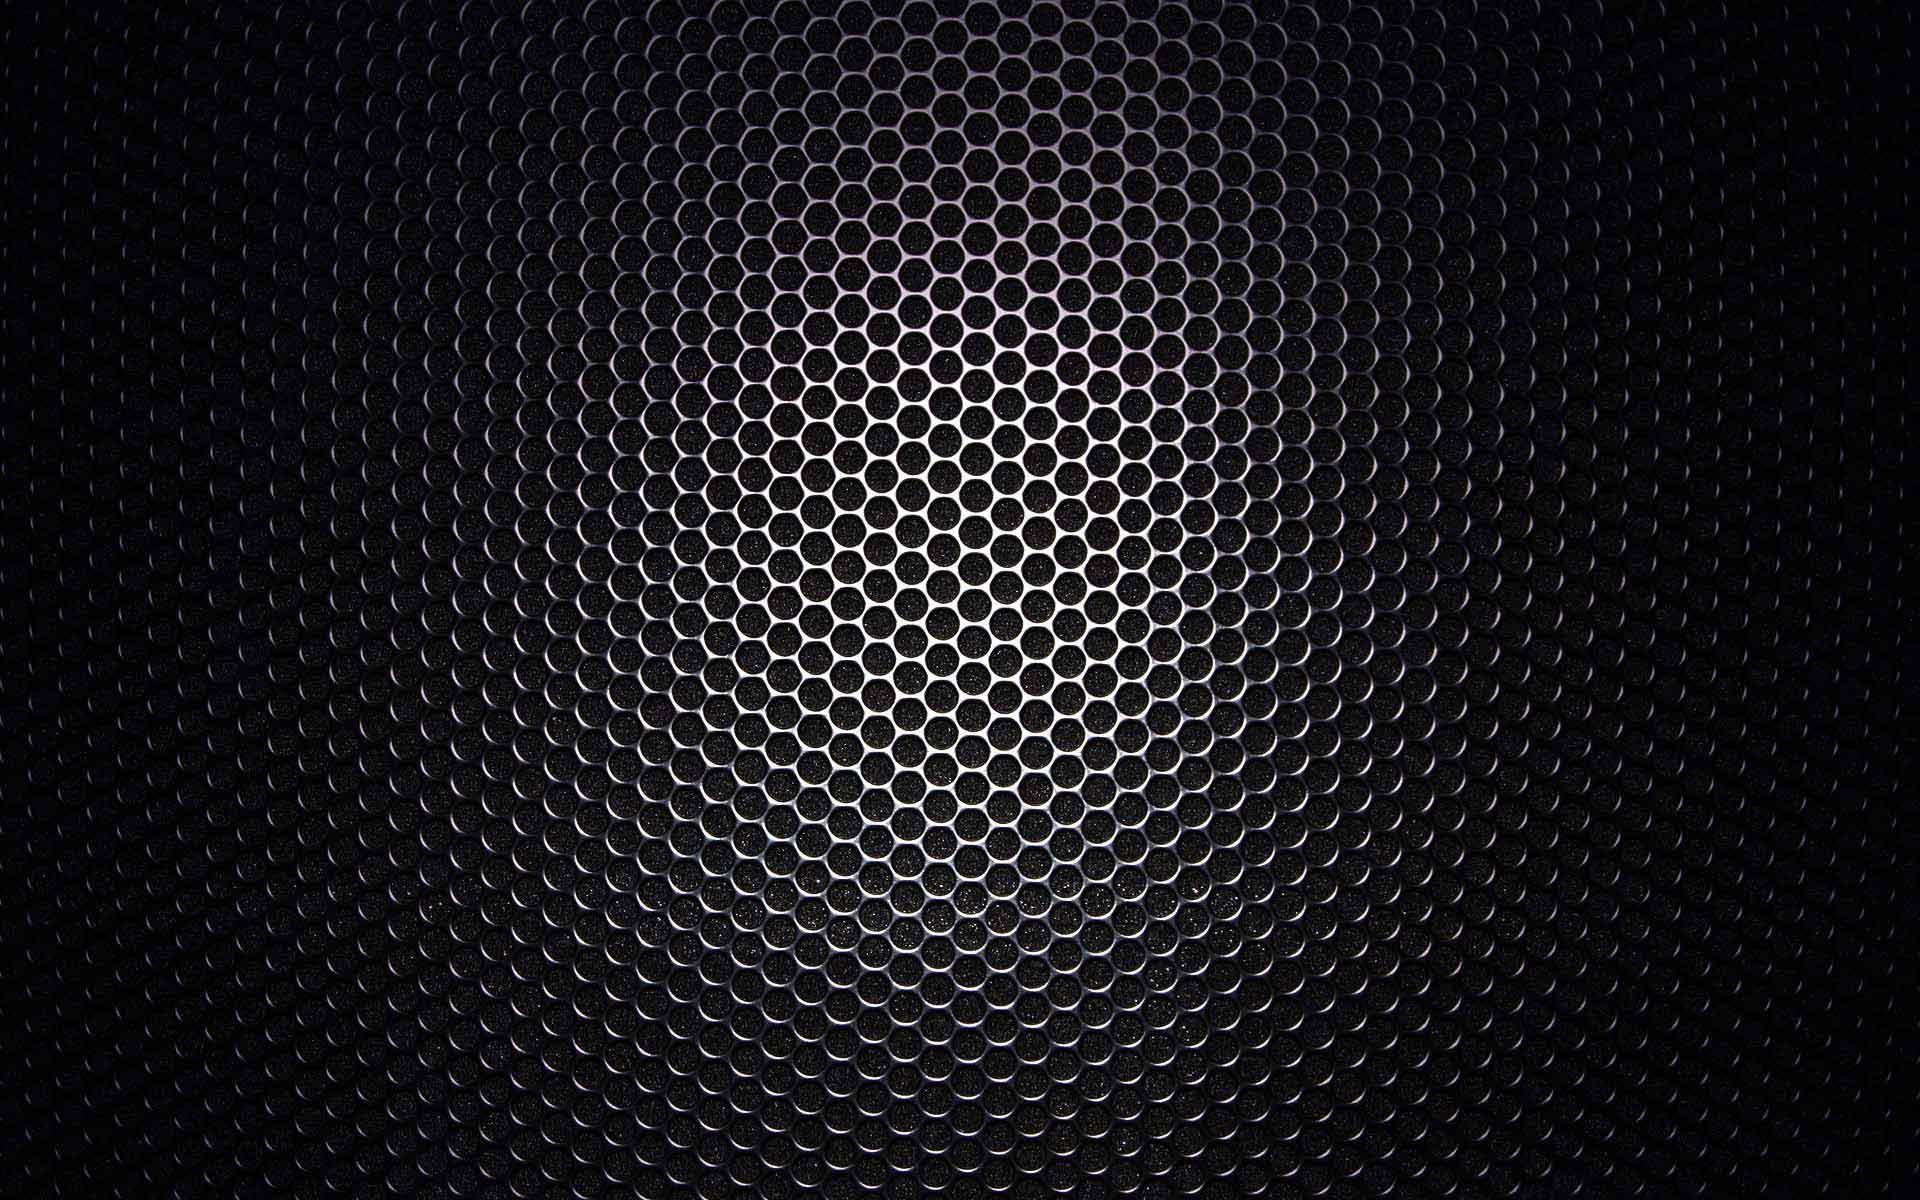 black-wallpaper-25.jpg